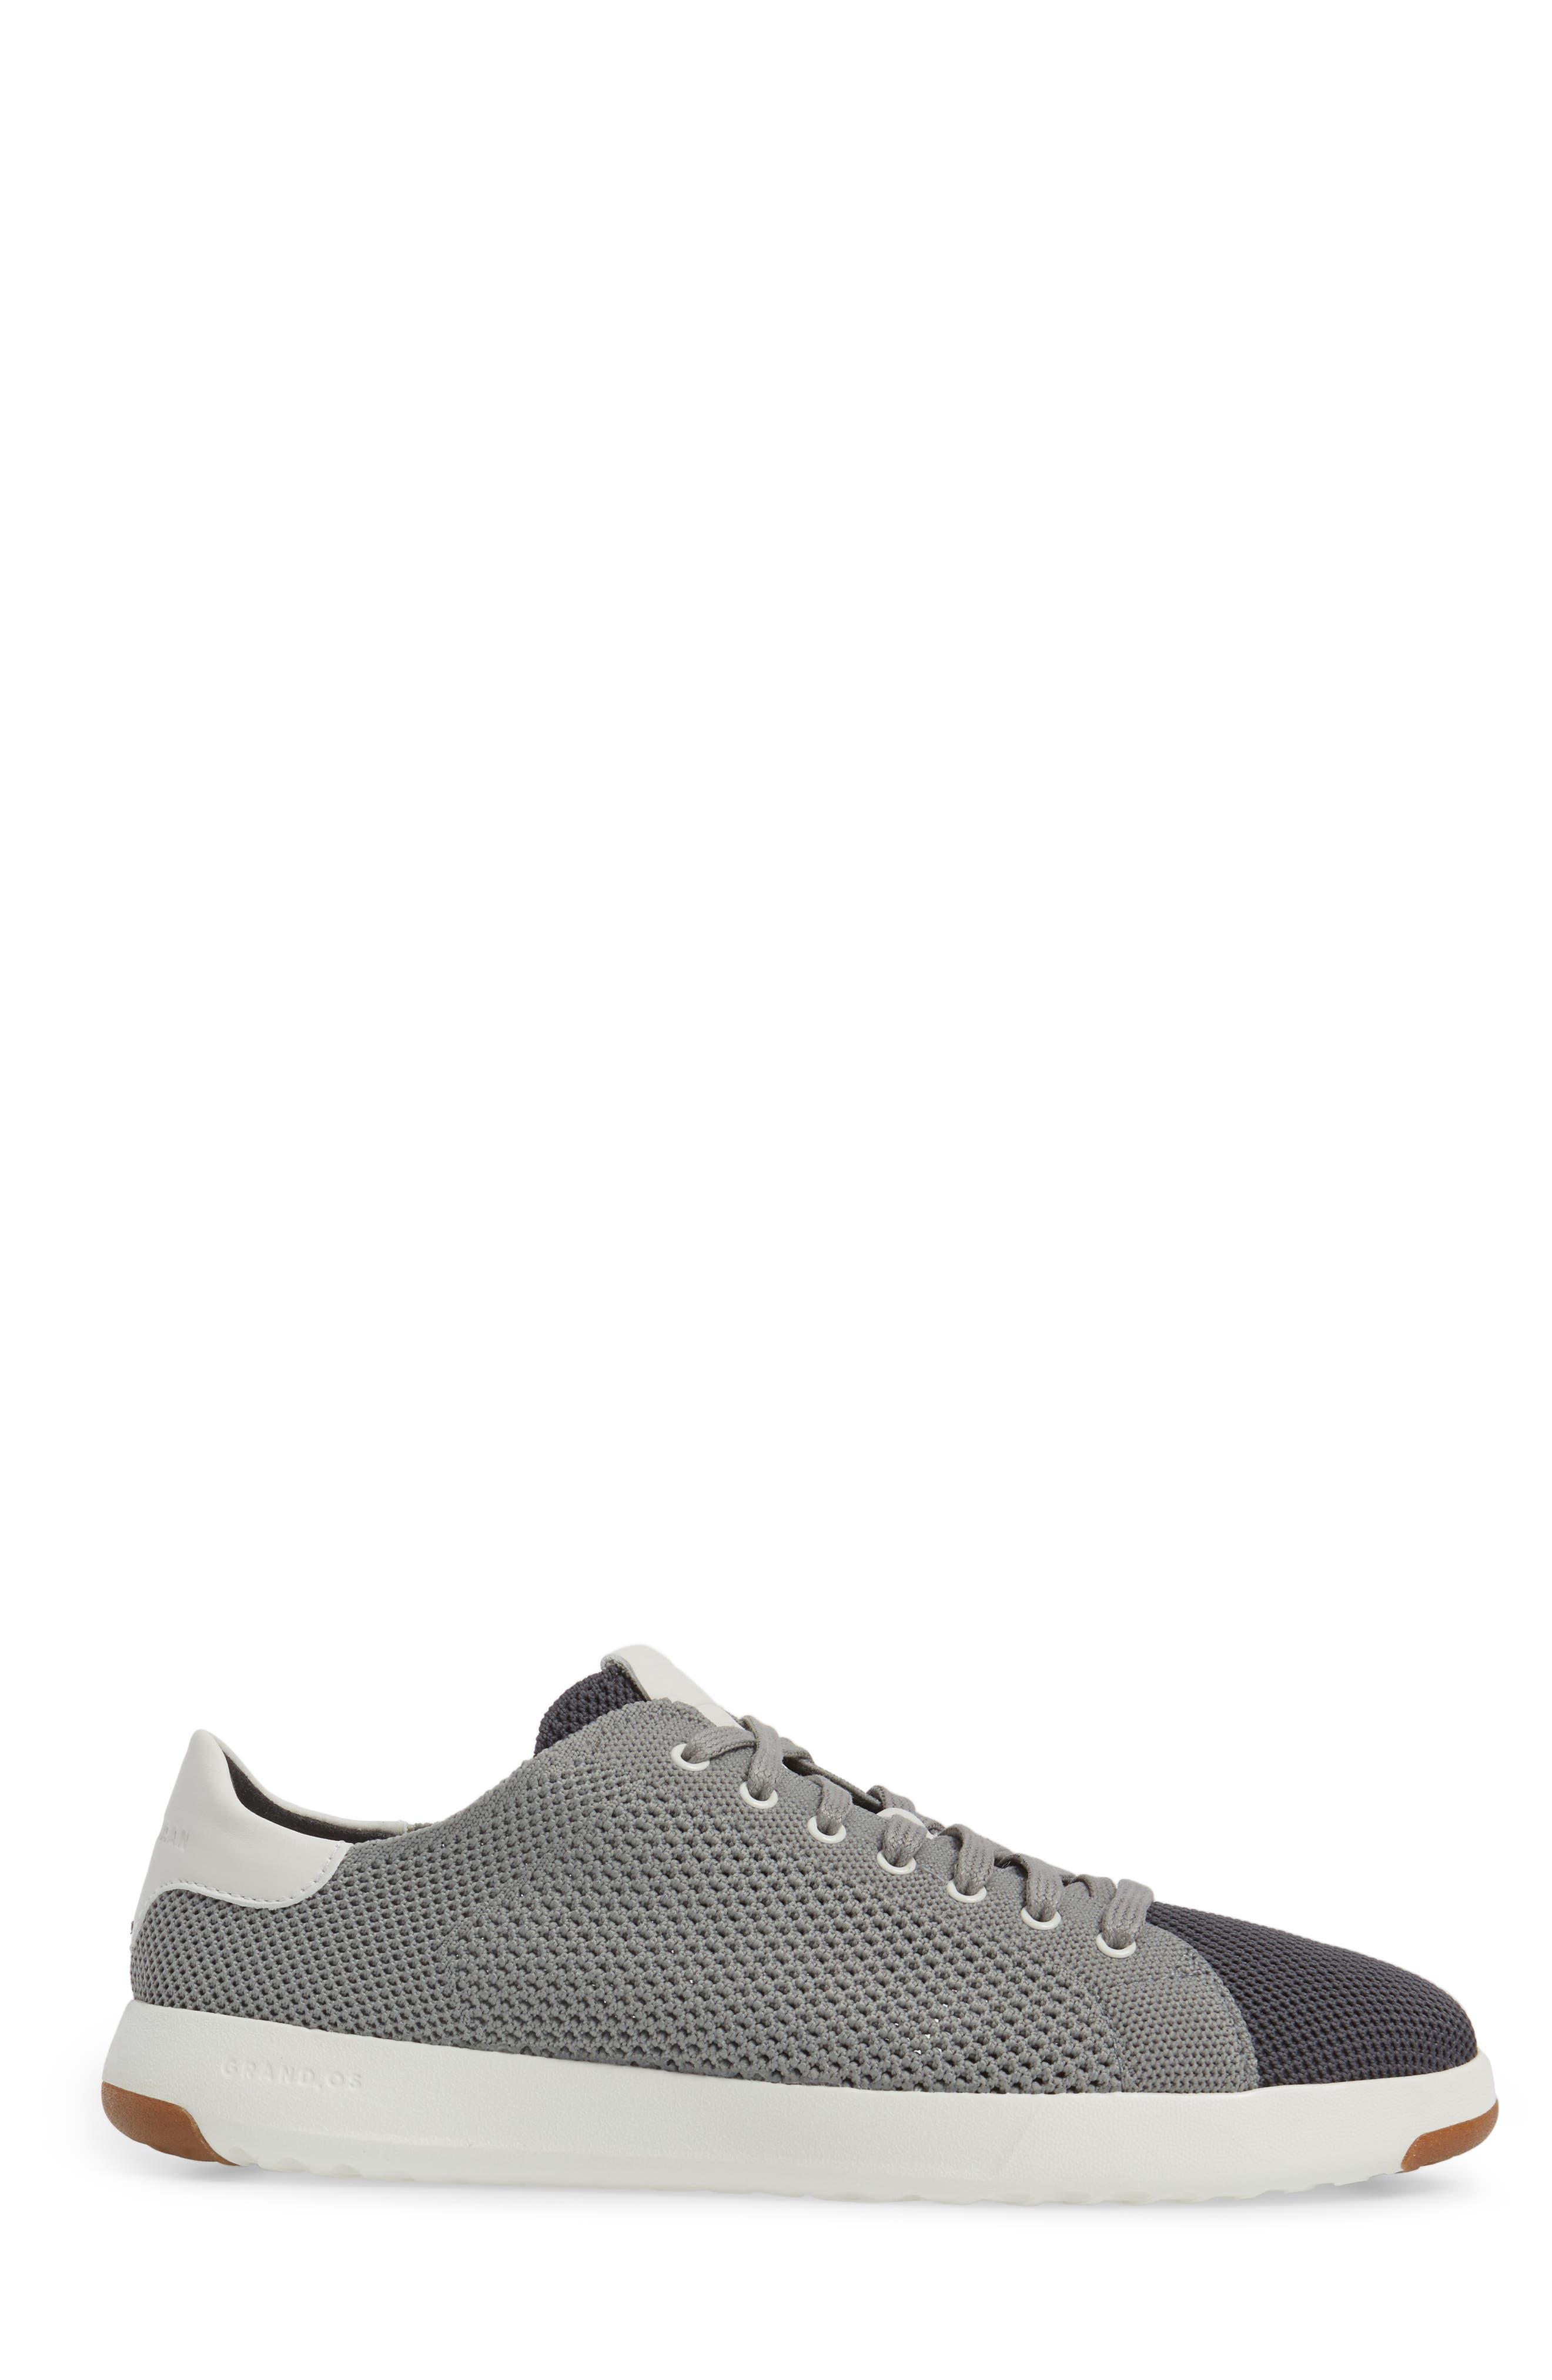 GrandPrø Stitchlite Tennis Sneaker,                             Alternate thumbnail 3, color,                             Magnet Grey Fabric